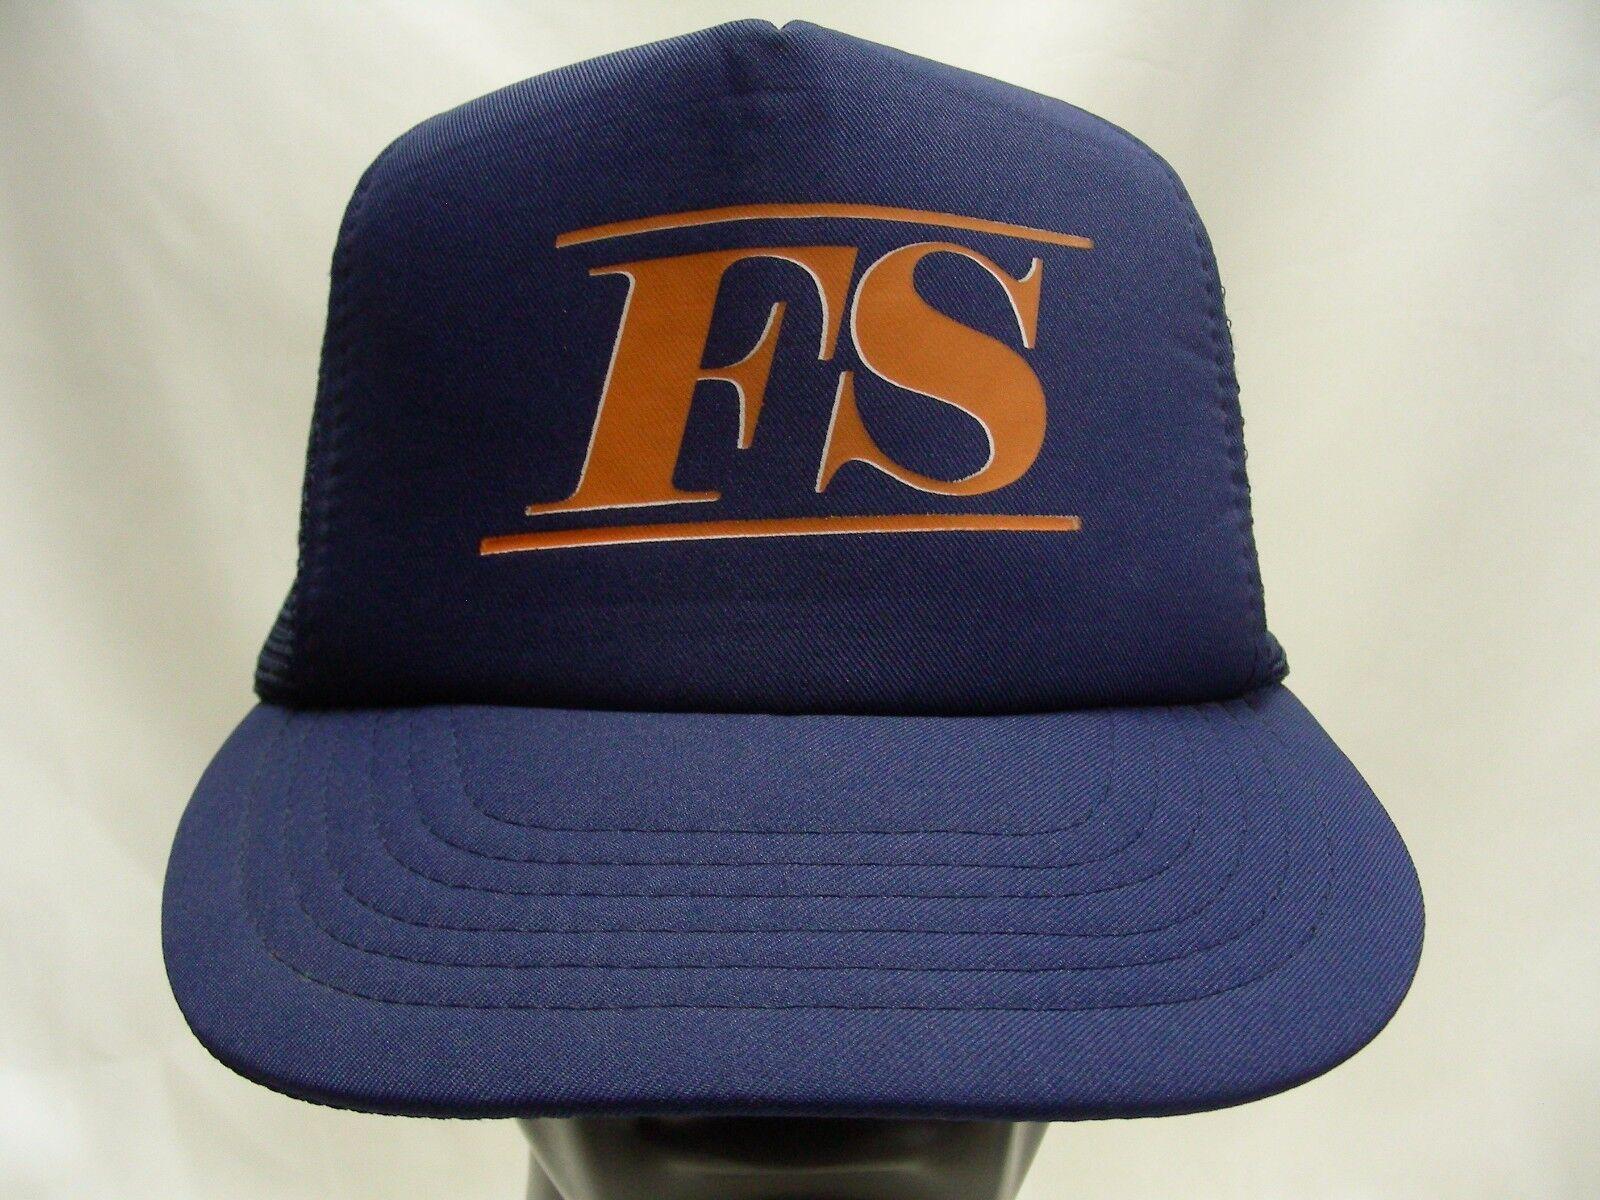 FS - LOGO - LARGE SIZE - FS VINTAGE TRUCKER STYLE ADJUSTABLE SNAPBACK BALL CAP HAT ded7db